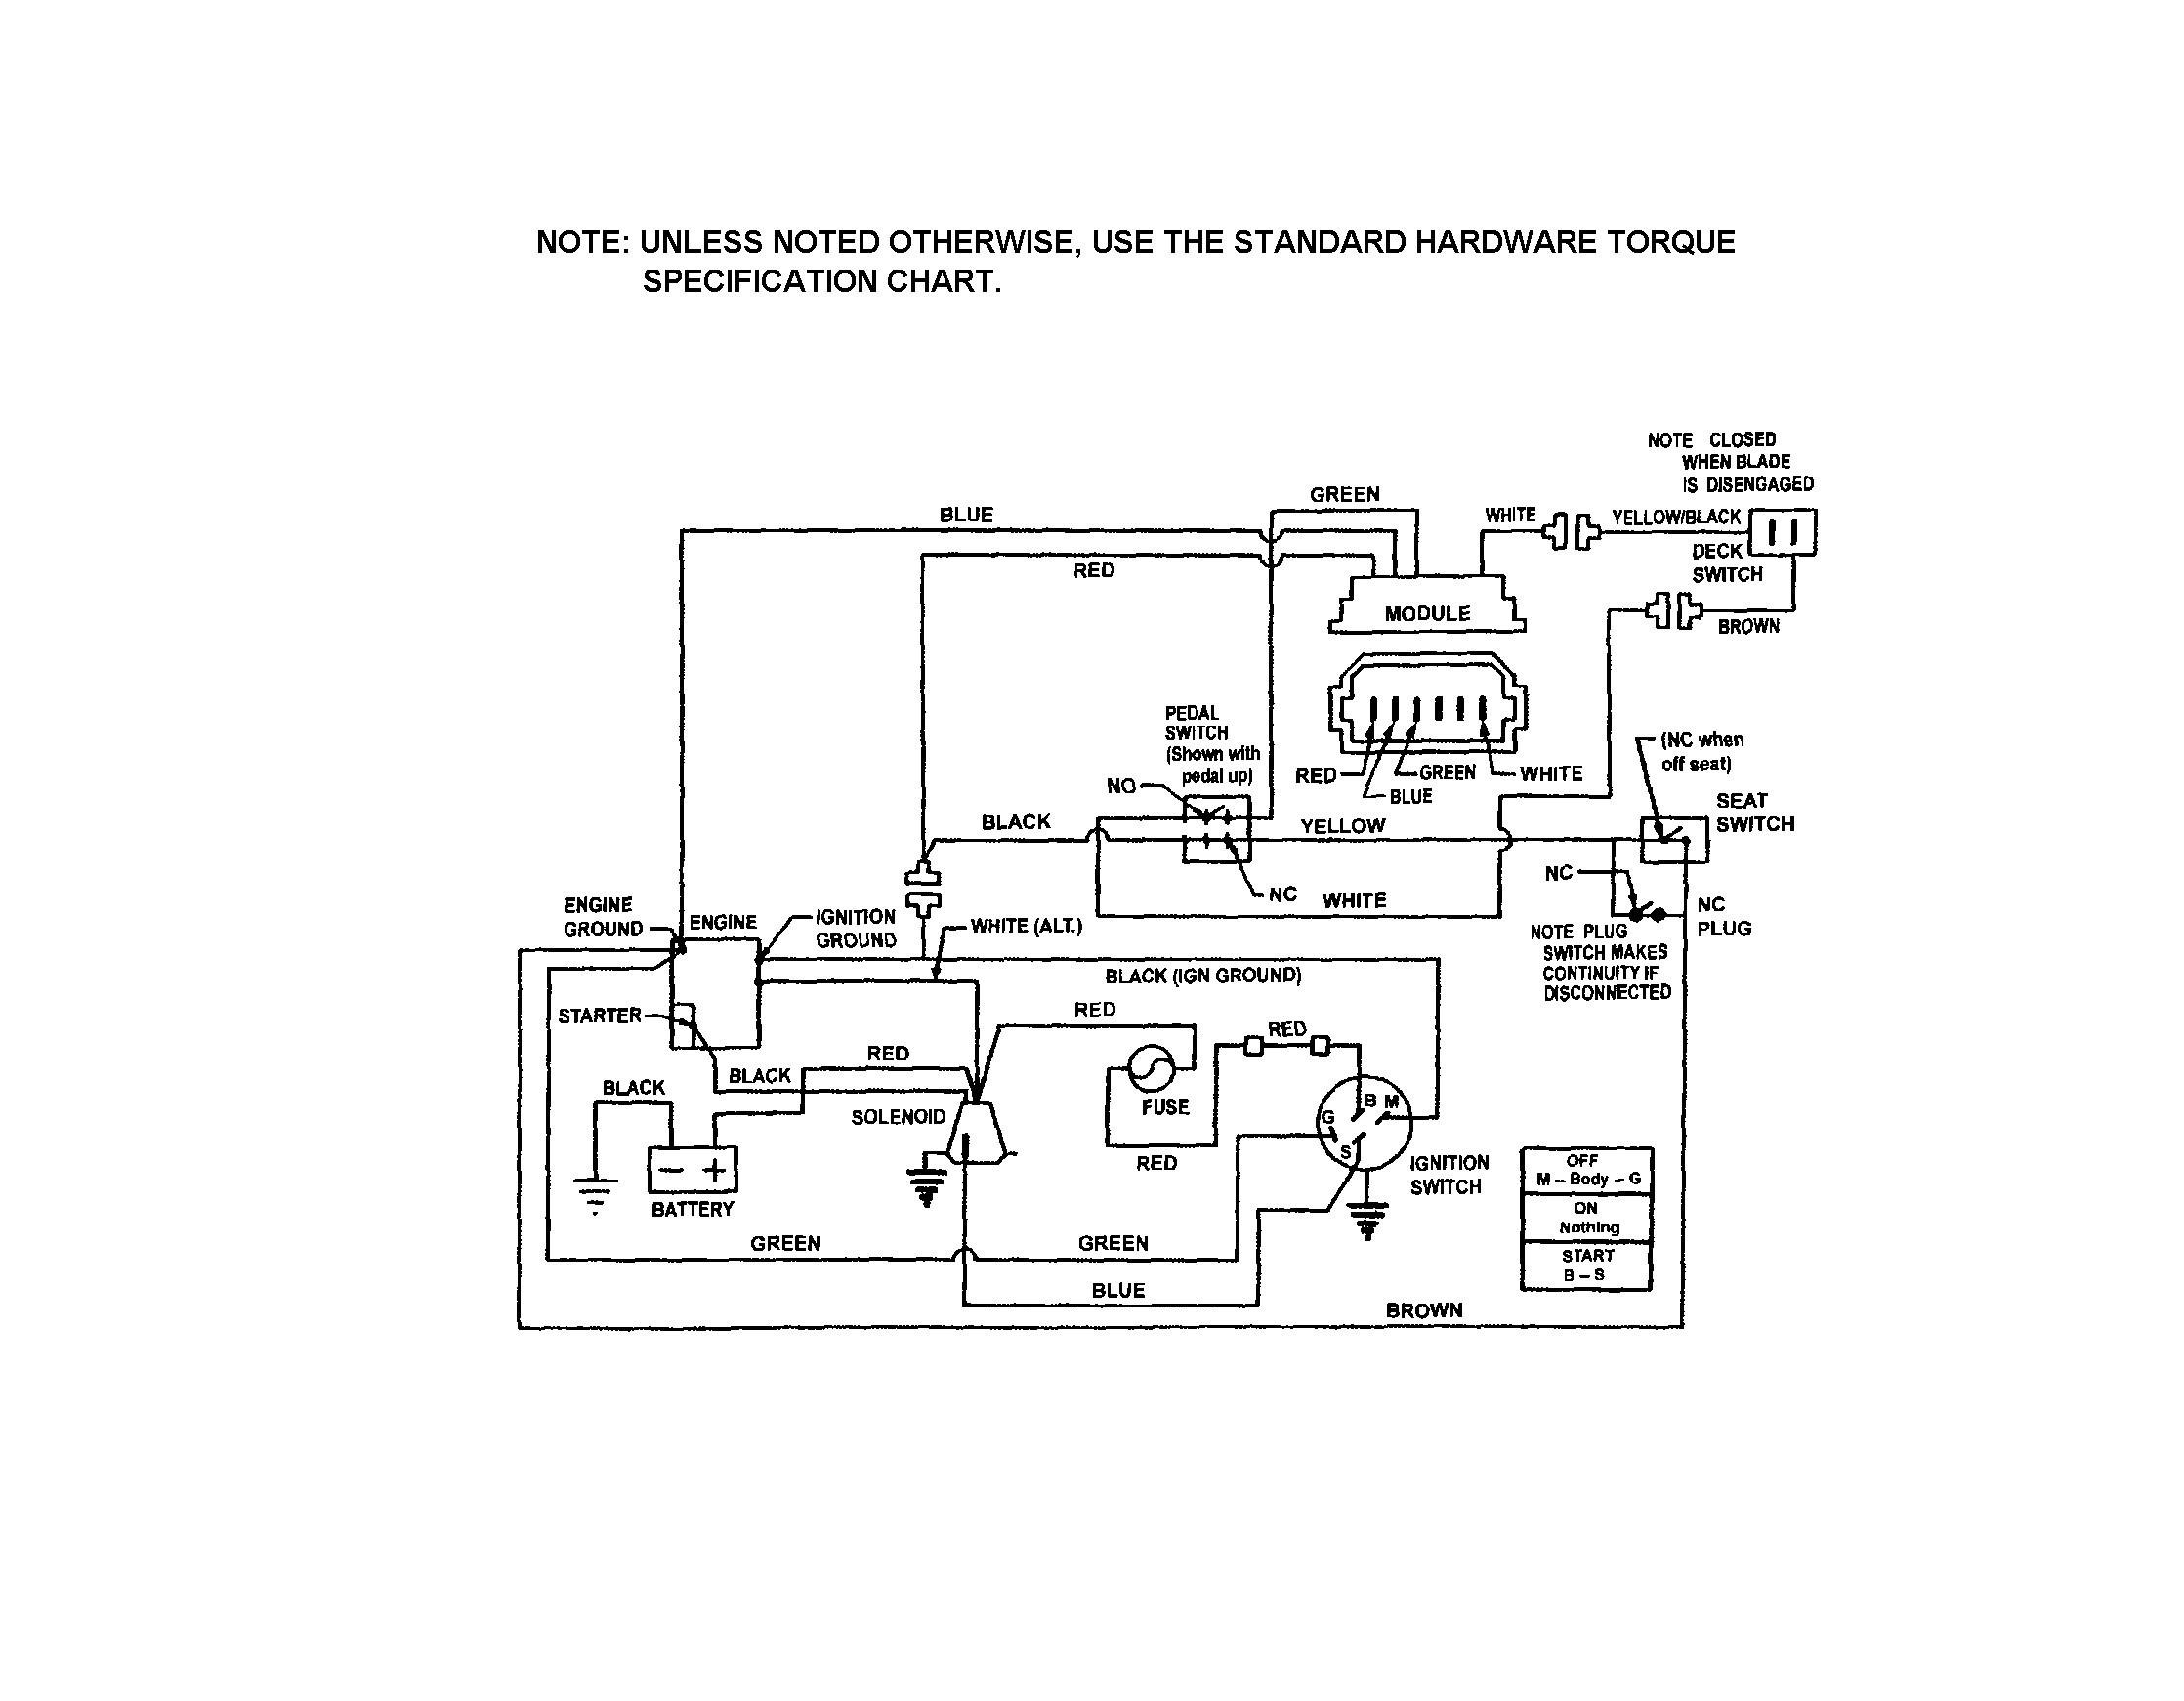 Wiring Diagram Briggs 17.5hpprofessional Engine Briggs and Stratton 17 5 Hp Engine Diagram Of Wiring Diagram Briggs 17.5hpprofessional Engine